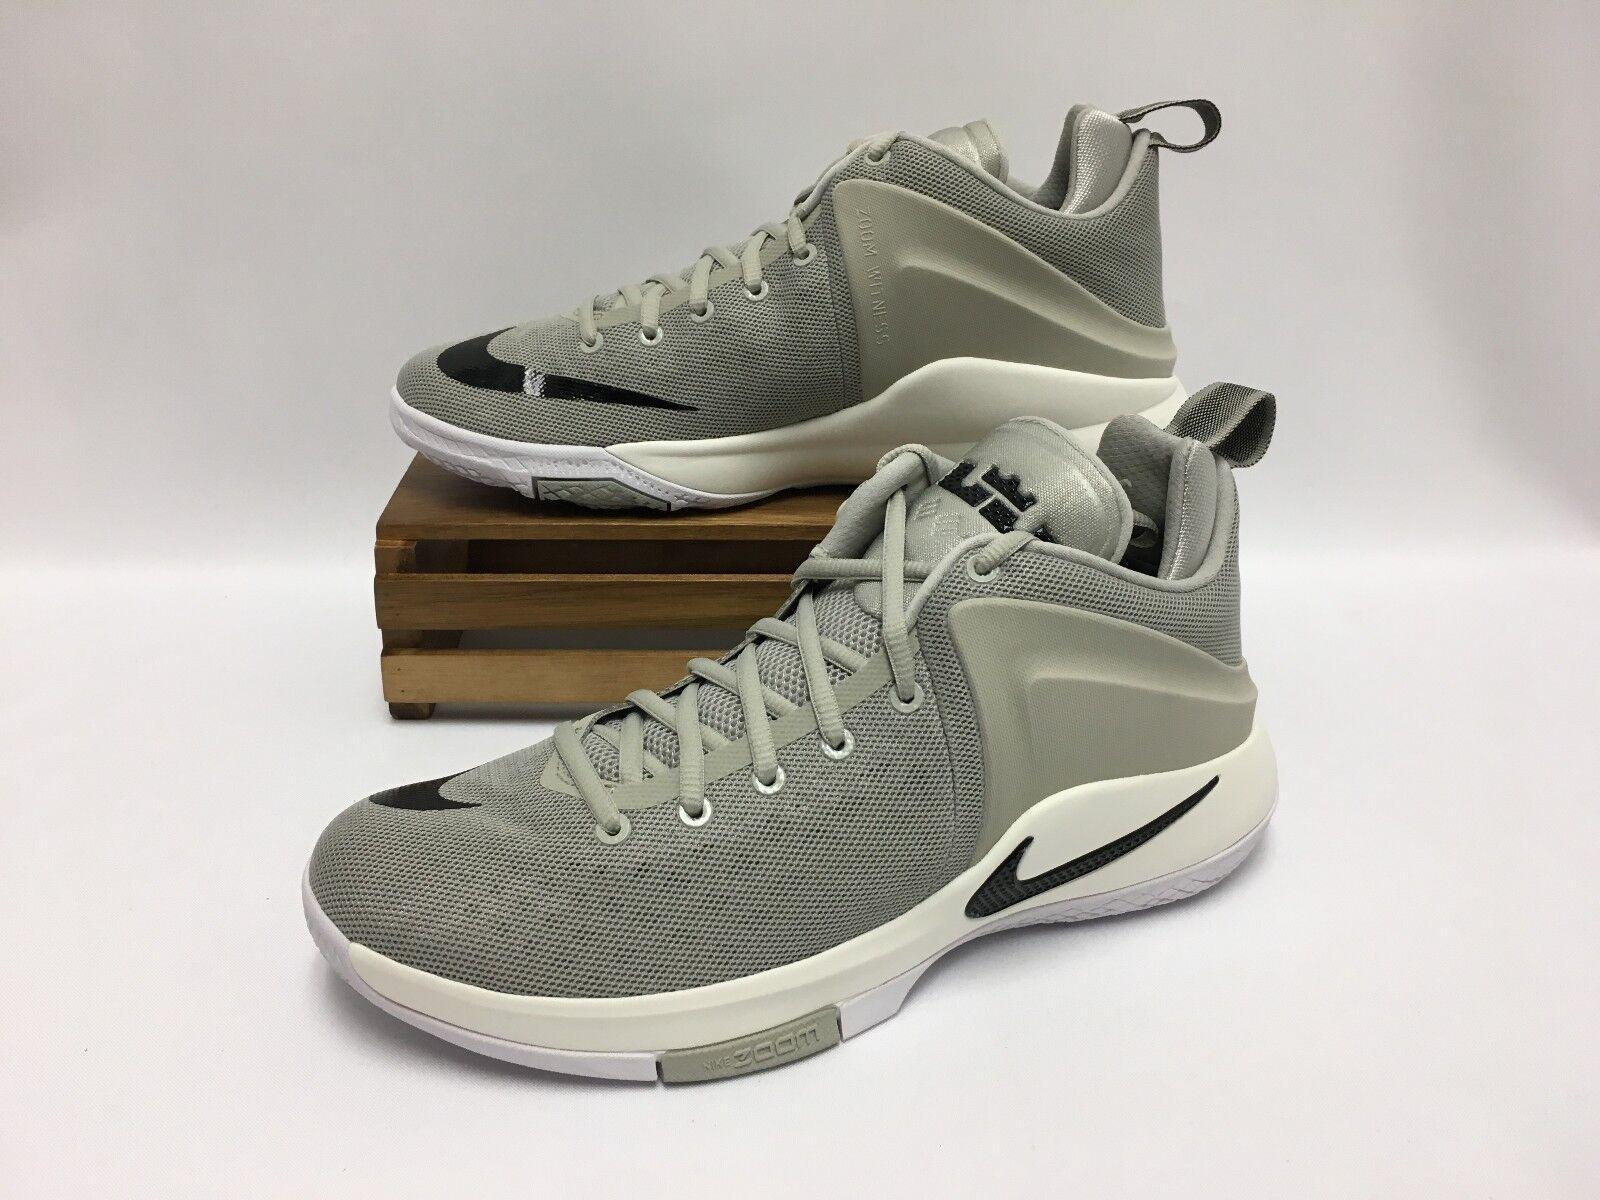 Nike zoom testimone lebron scarpe da basket grigio bianco nero 852439-011 uomini e 12